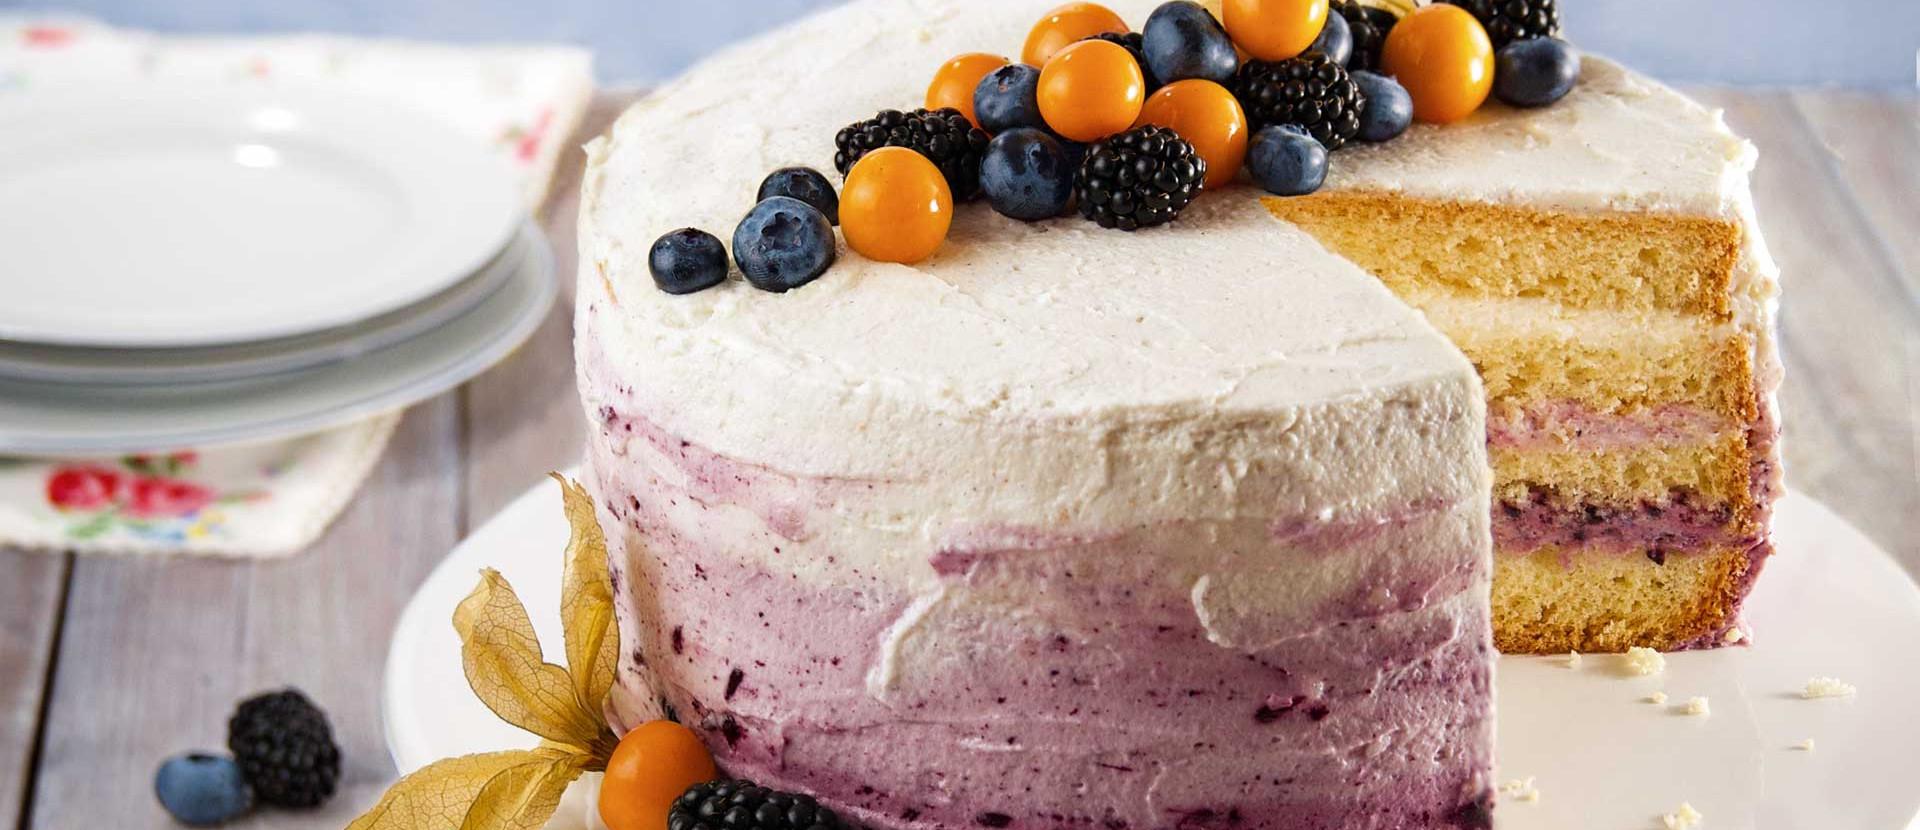 Ombre Torte mit Heidelbeeren und Physalis